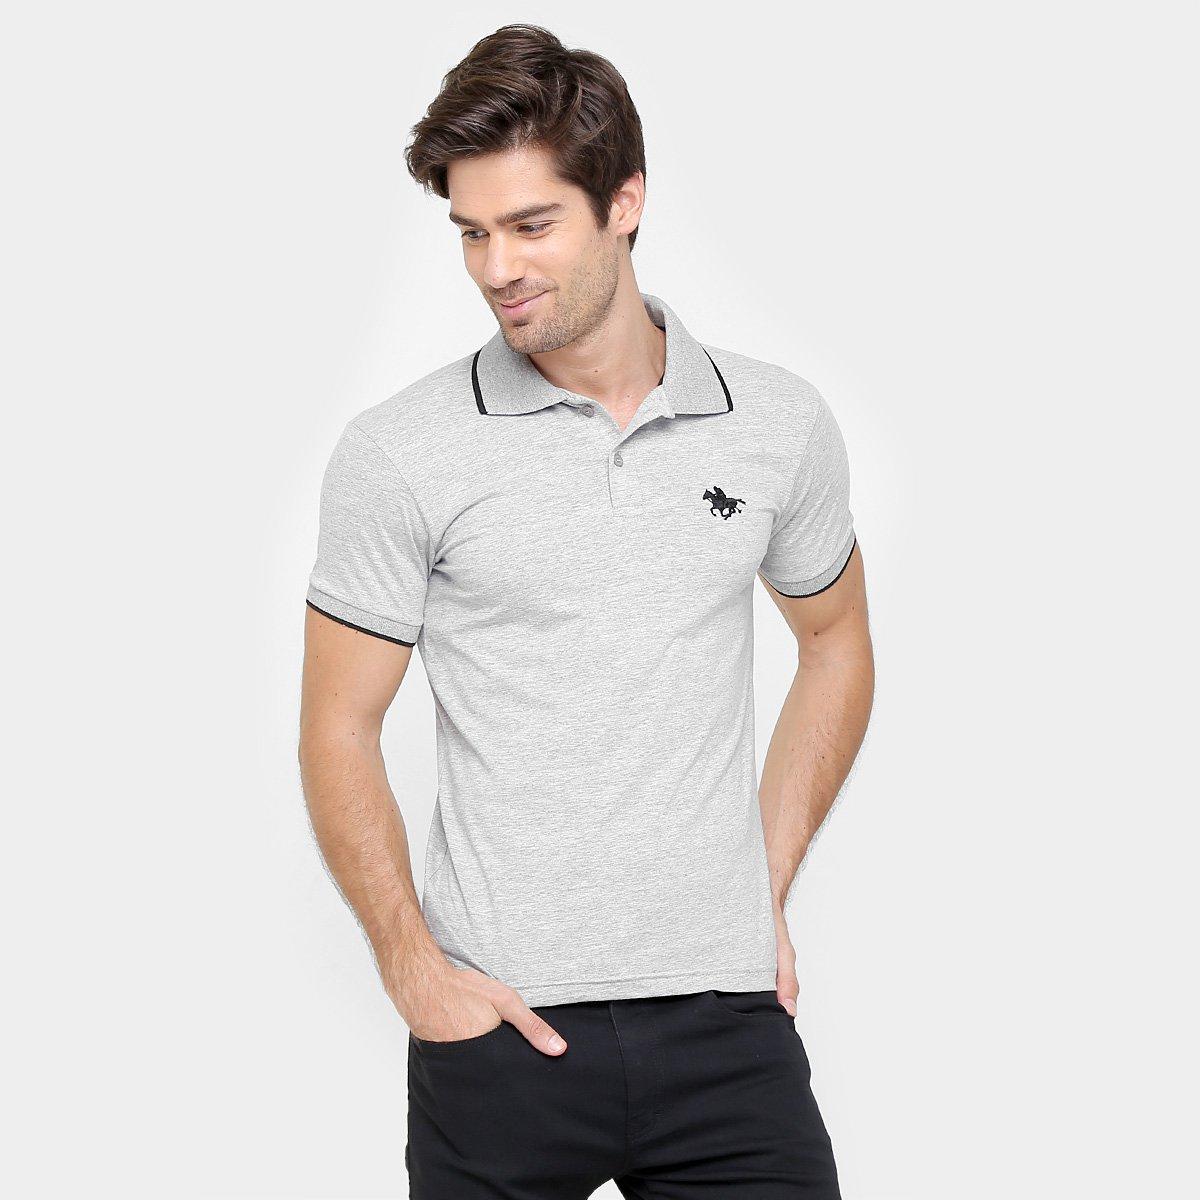 Camisa Polo RG 518 Malha Friso Logo Masculina 148b1bfc91dde